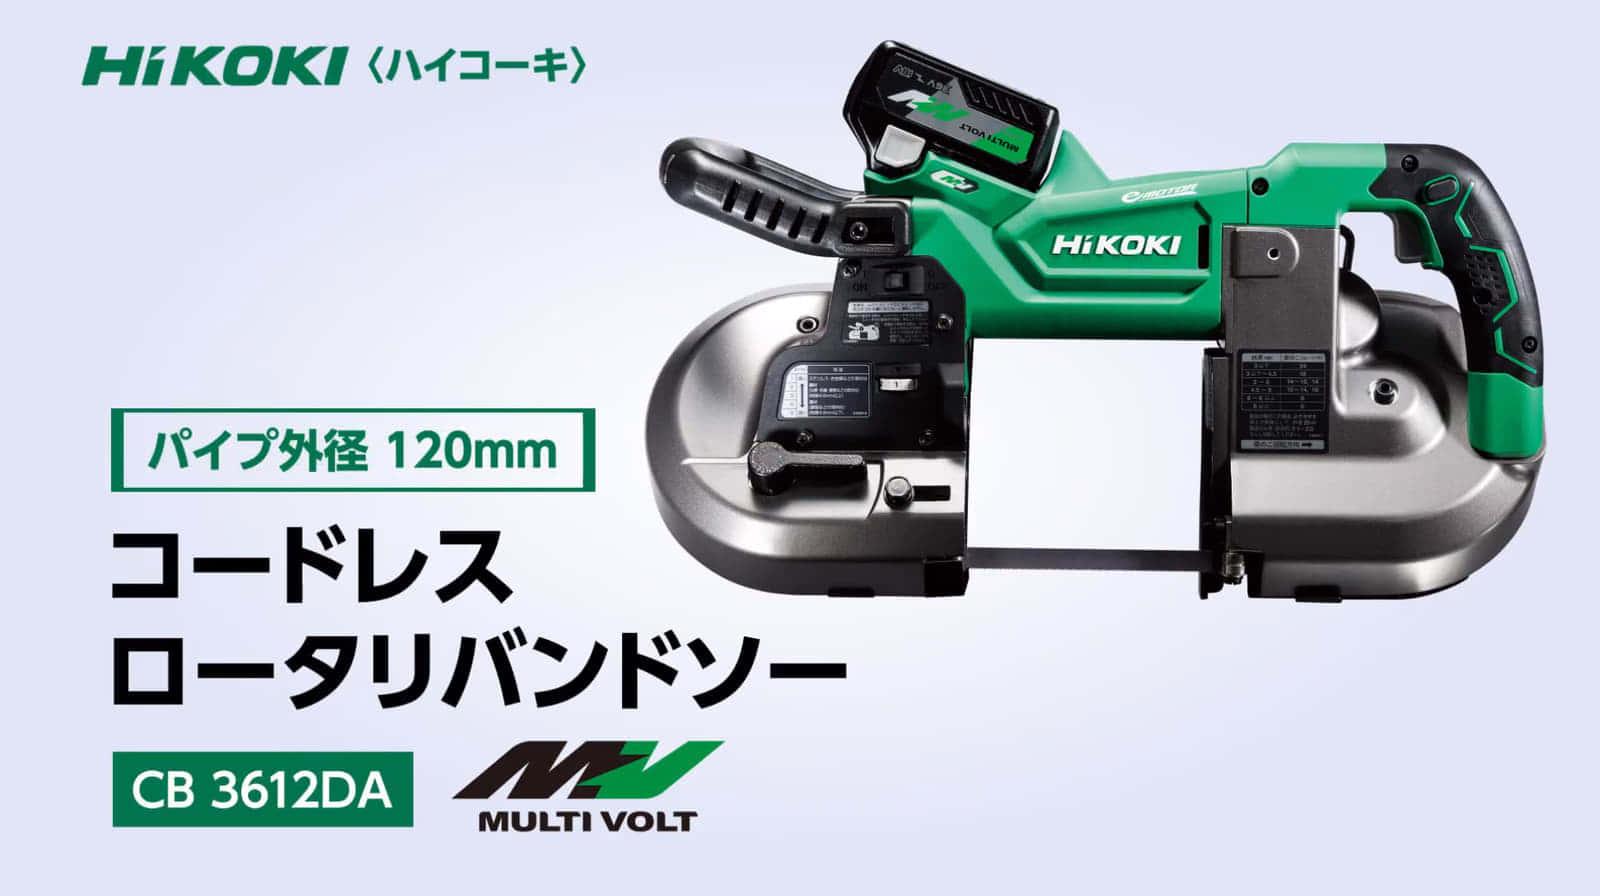 HiKOKi CB3612DA マルチボルトバンドソー、電源コード式より6倍速い切断スピード